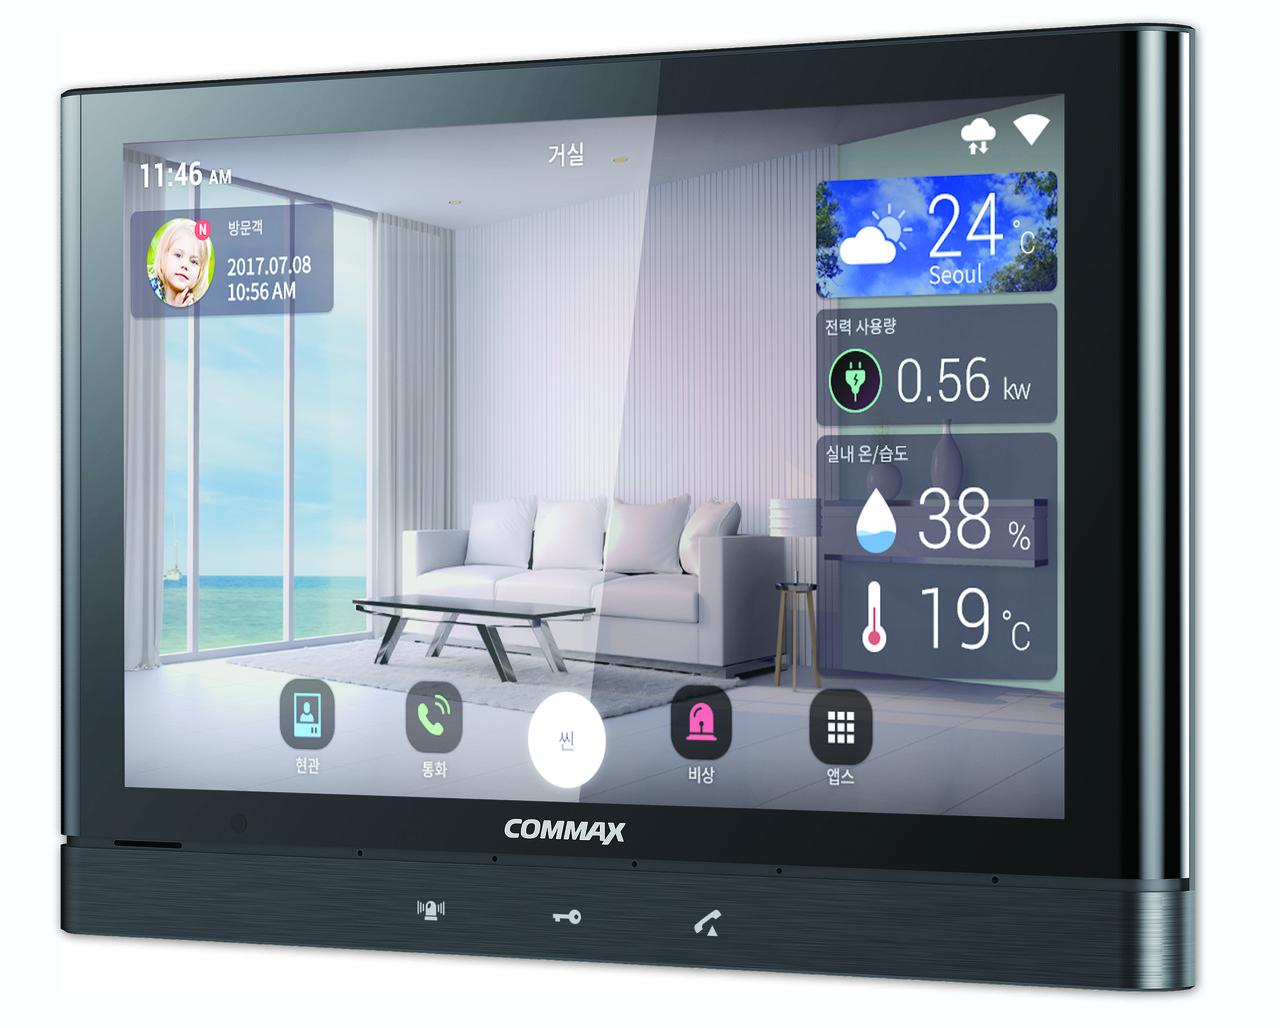 COMMAX-CIOT-1000Y-IP монитор, ОС Android, Технология Wi-Fi и IoT (Gray)